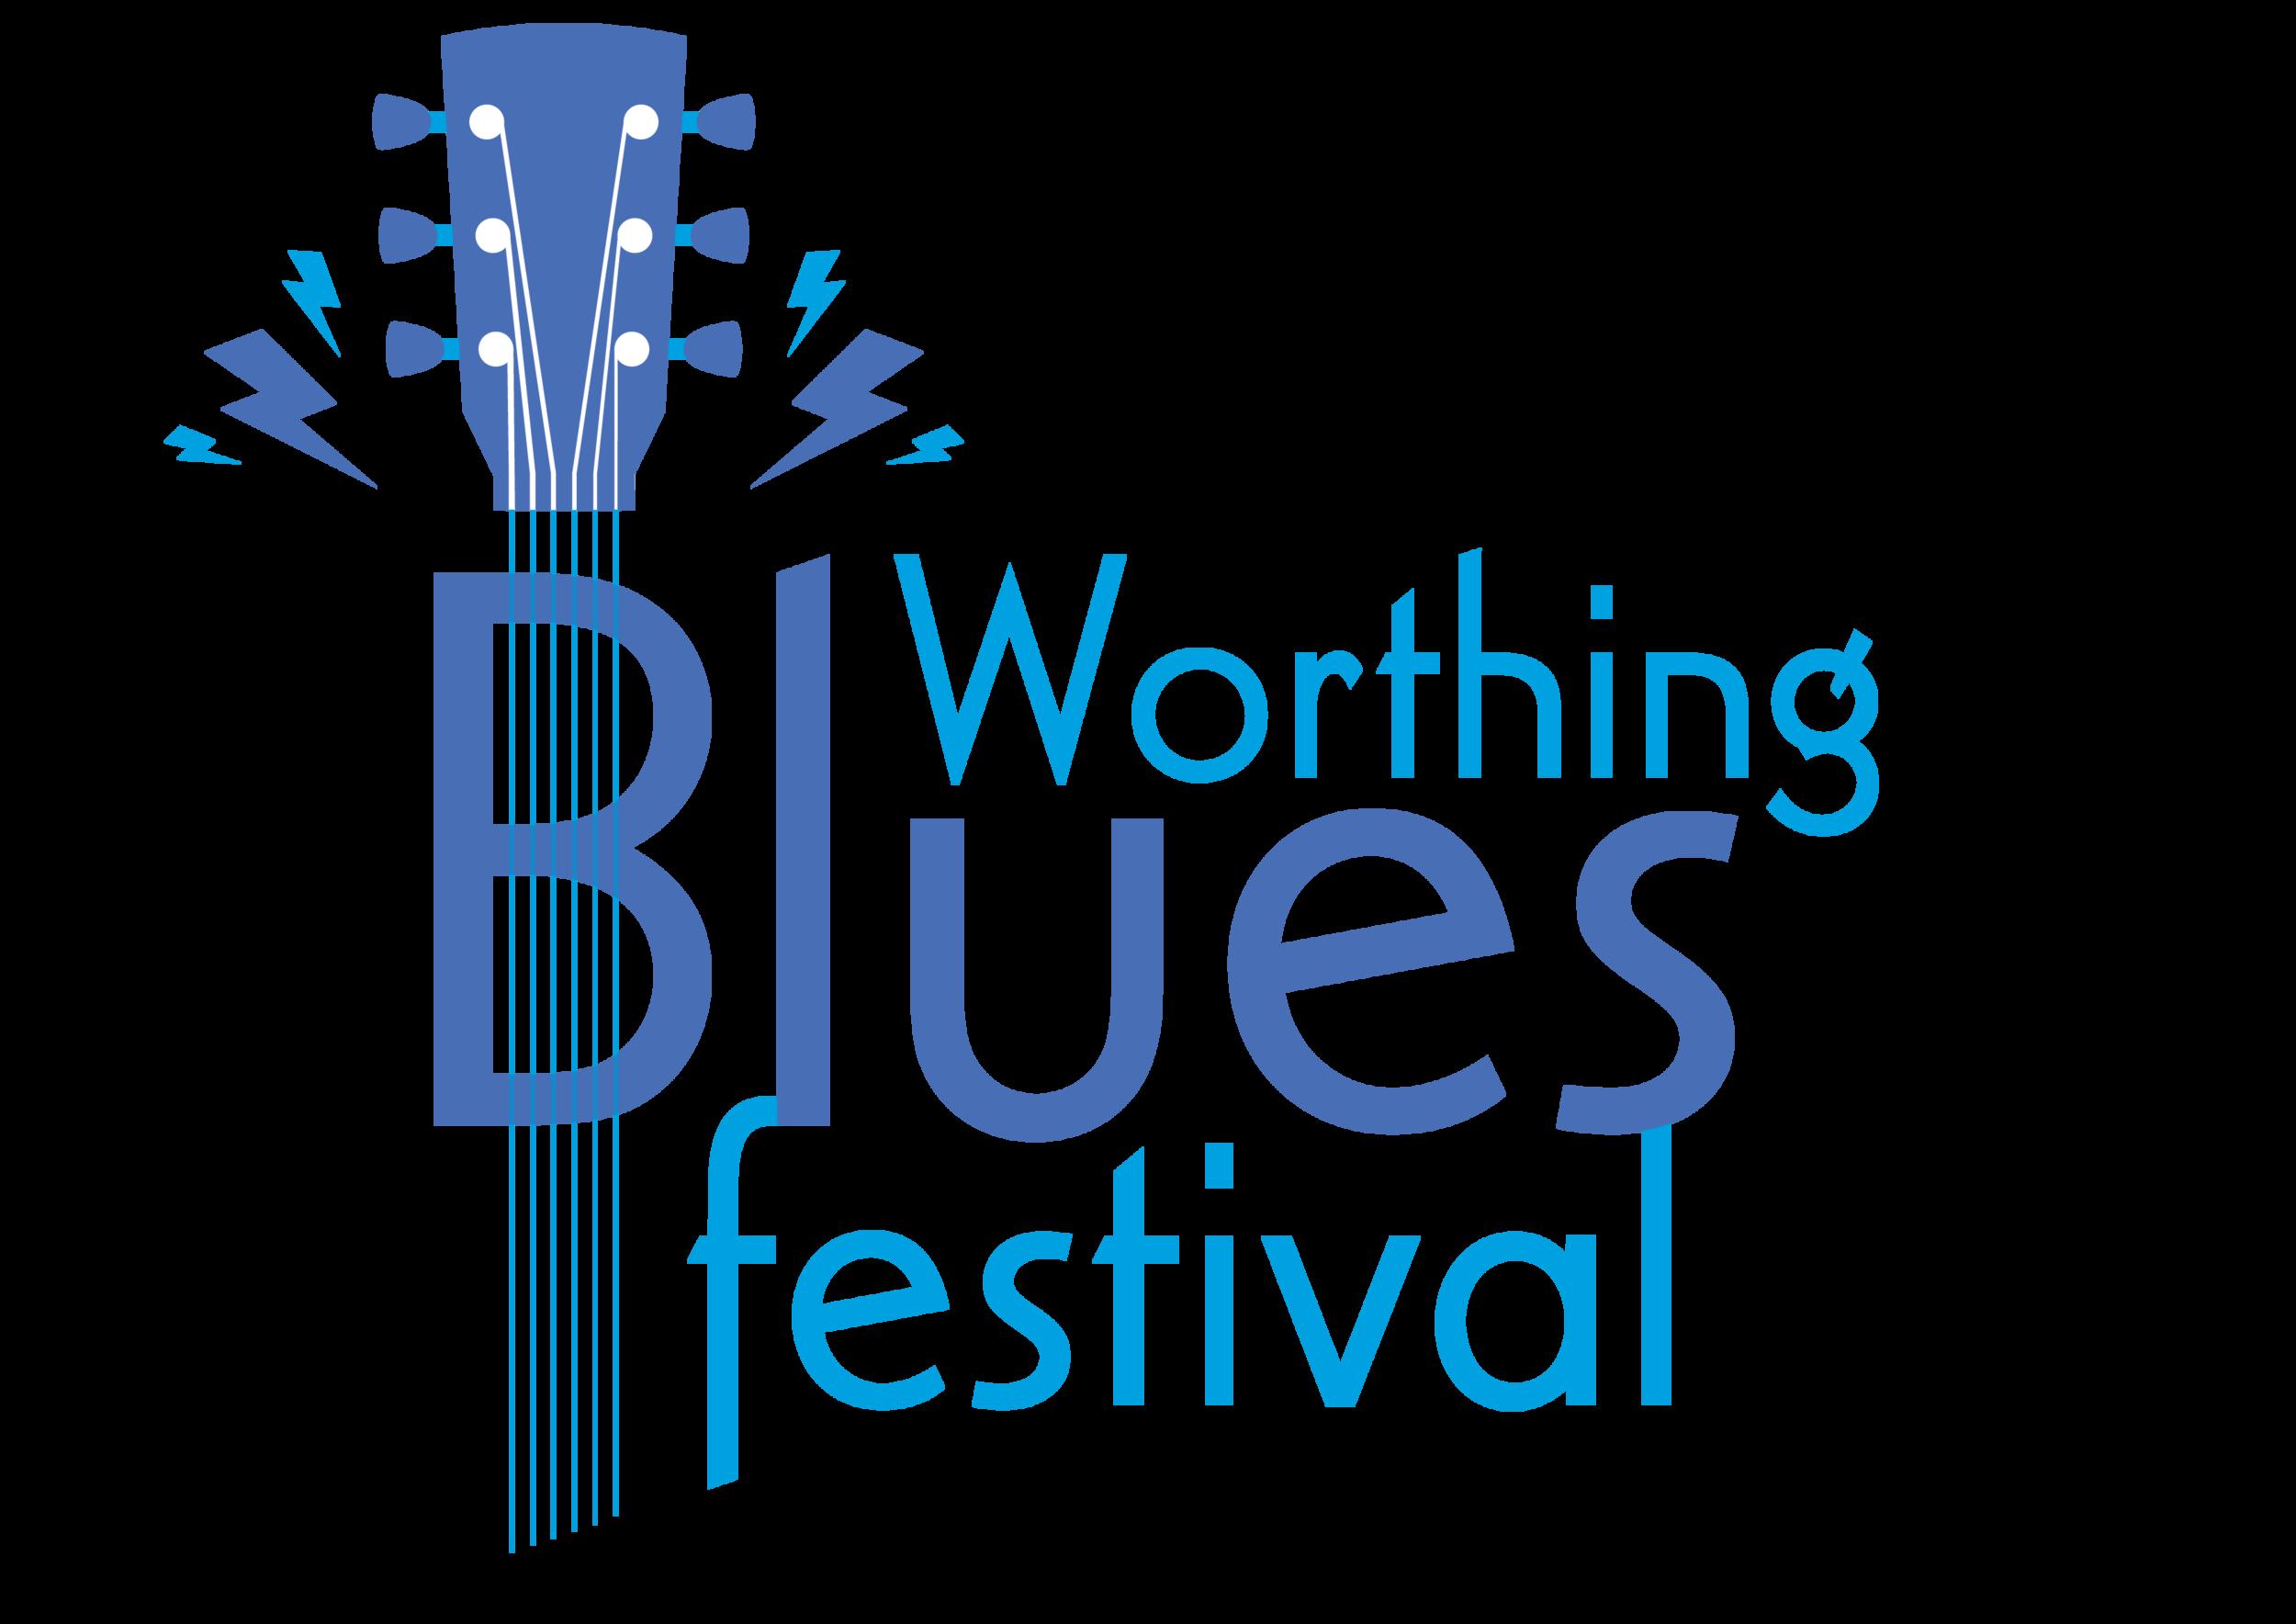 Worthing Blues Festival